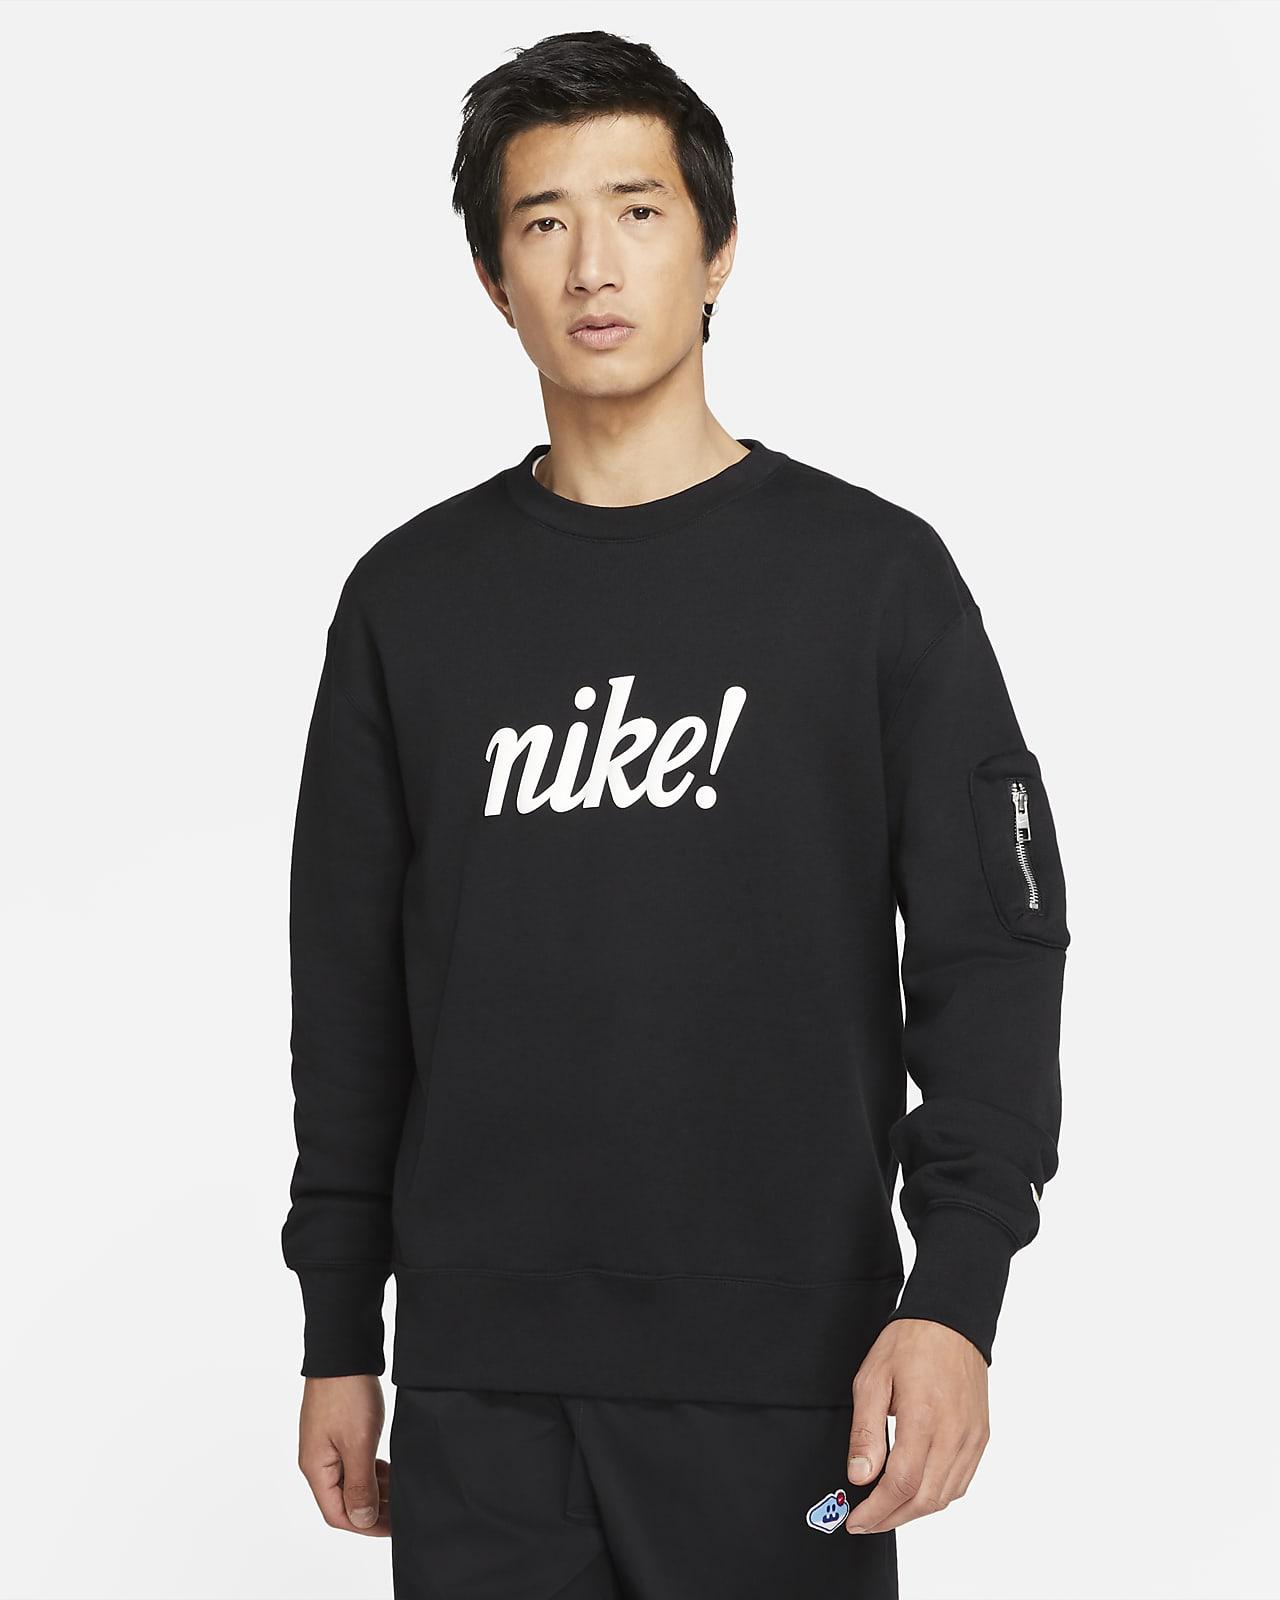 Nike Sportswear Men's French Terry Crew